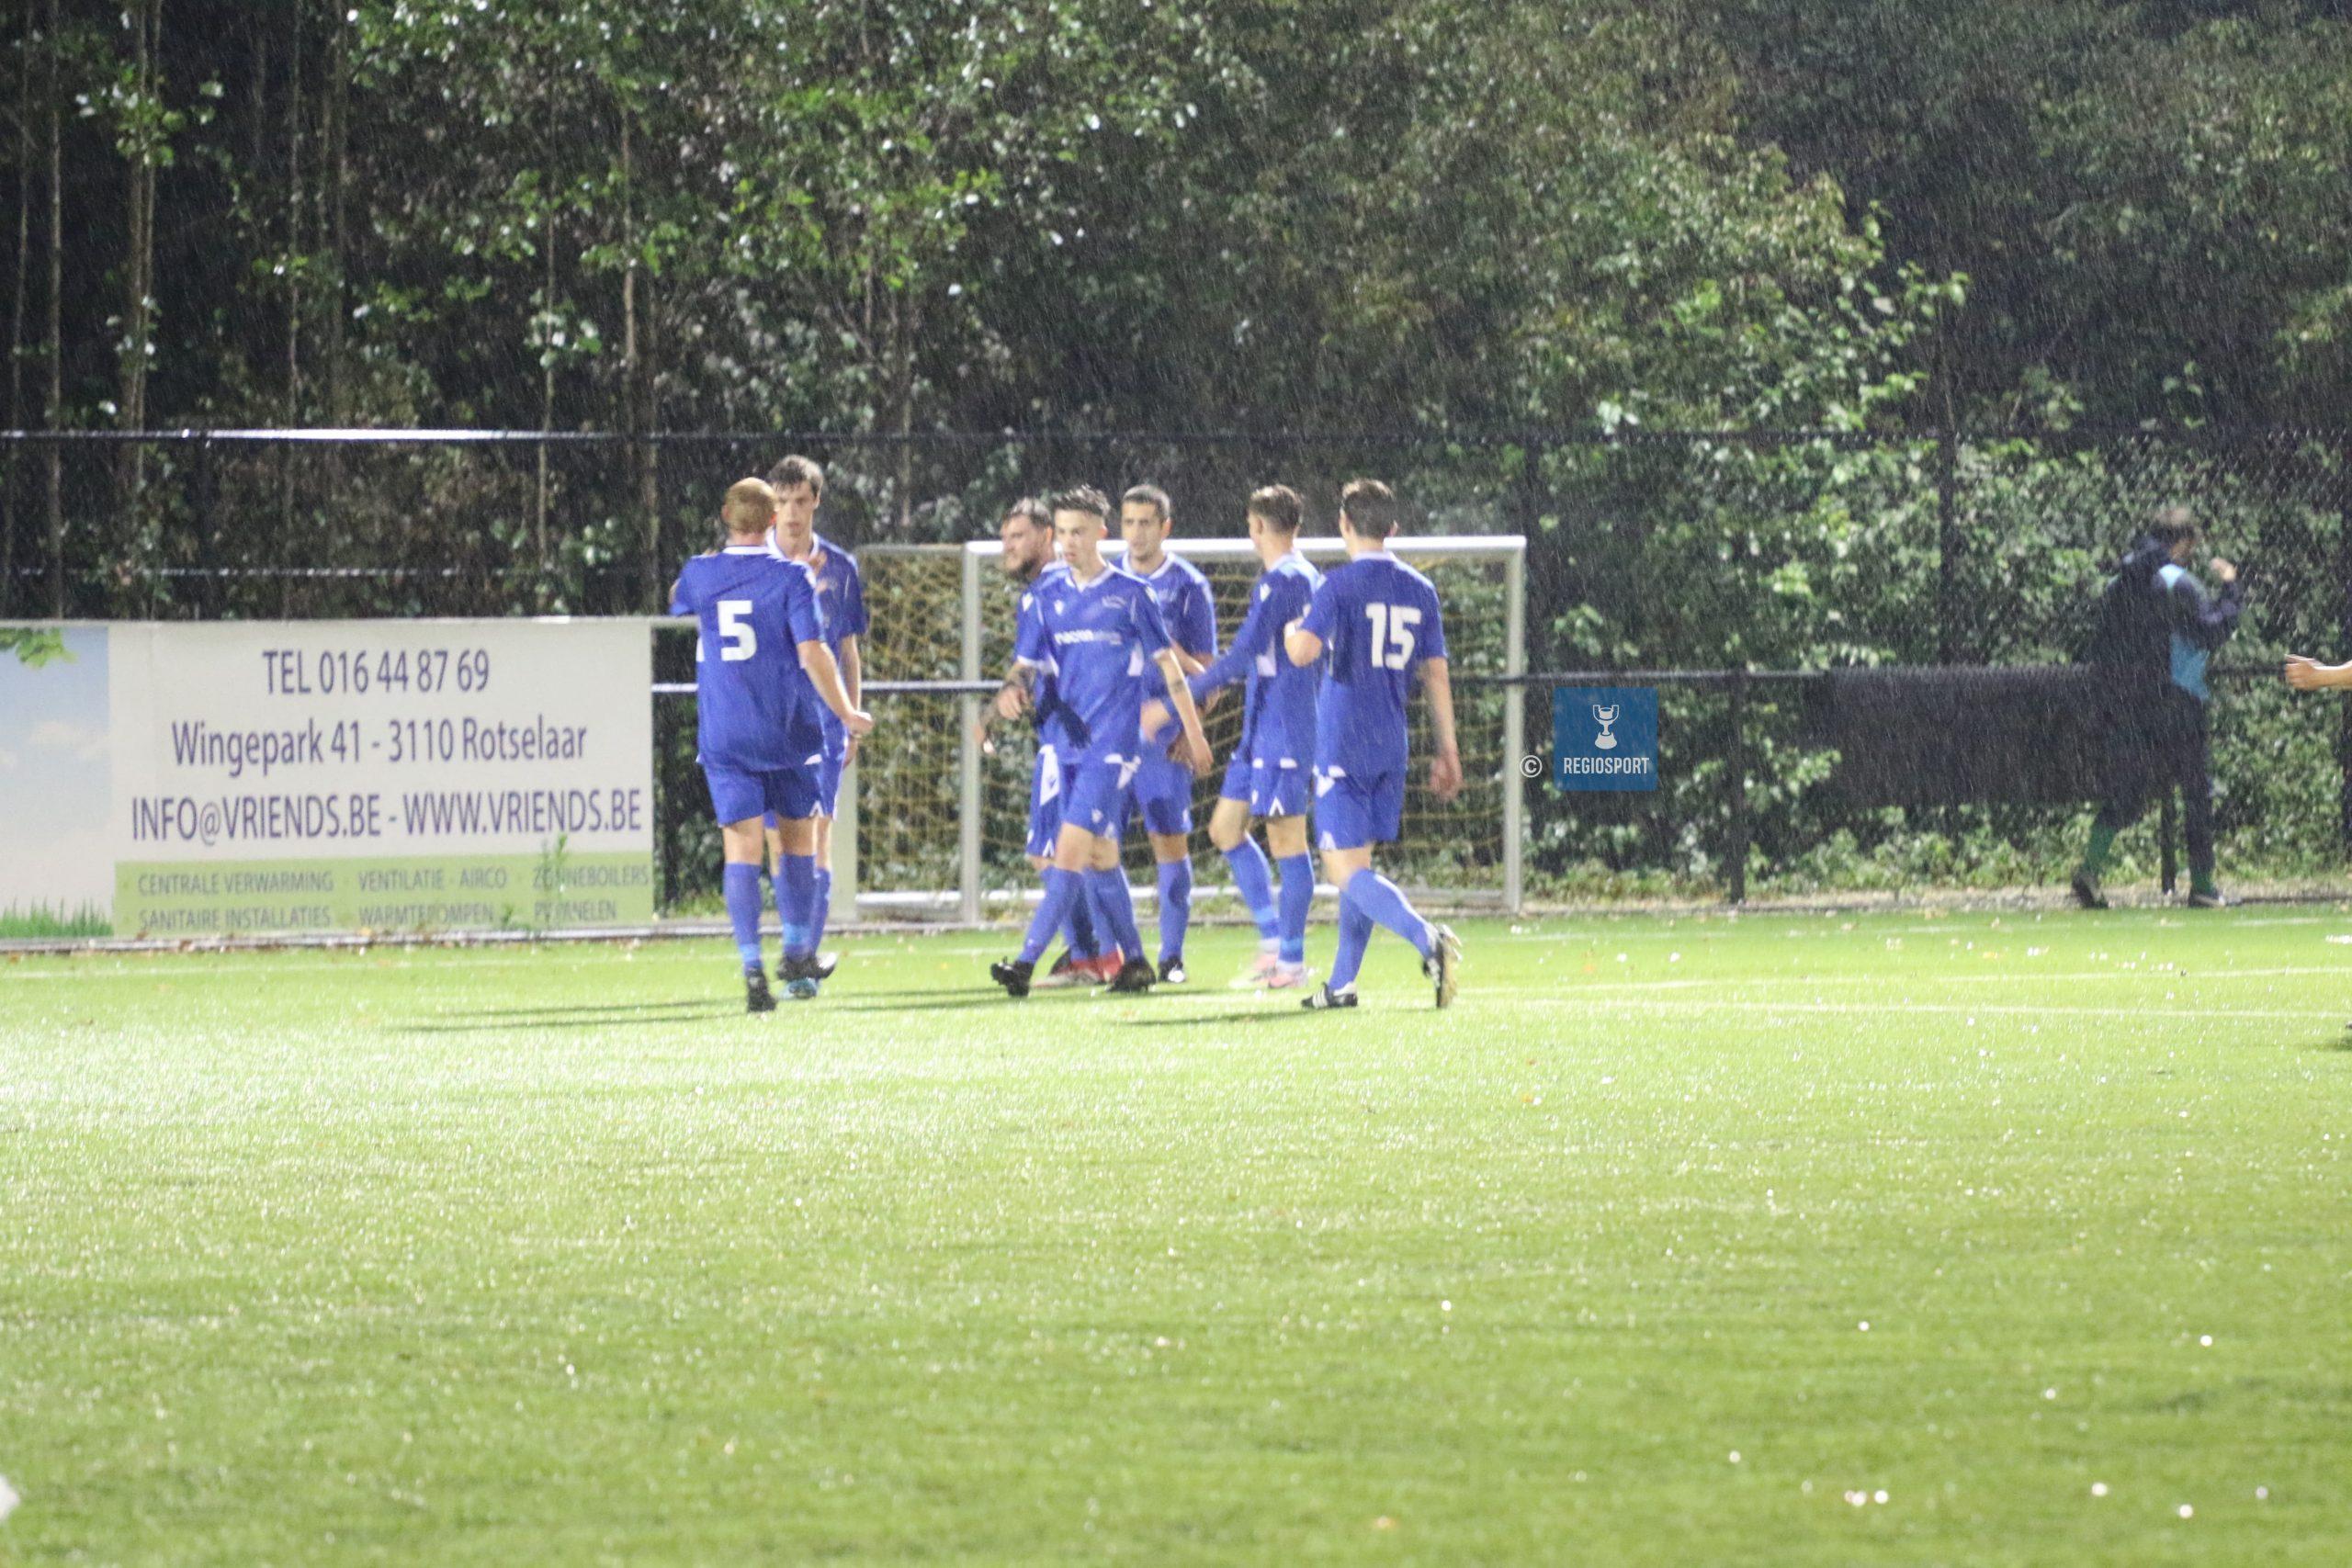 Racing Butsel – FC Binkom 3-0, Butsel bracht meer gevaar